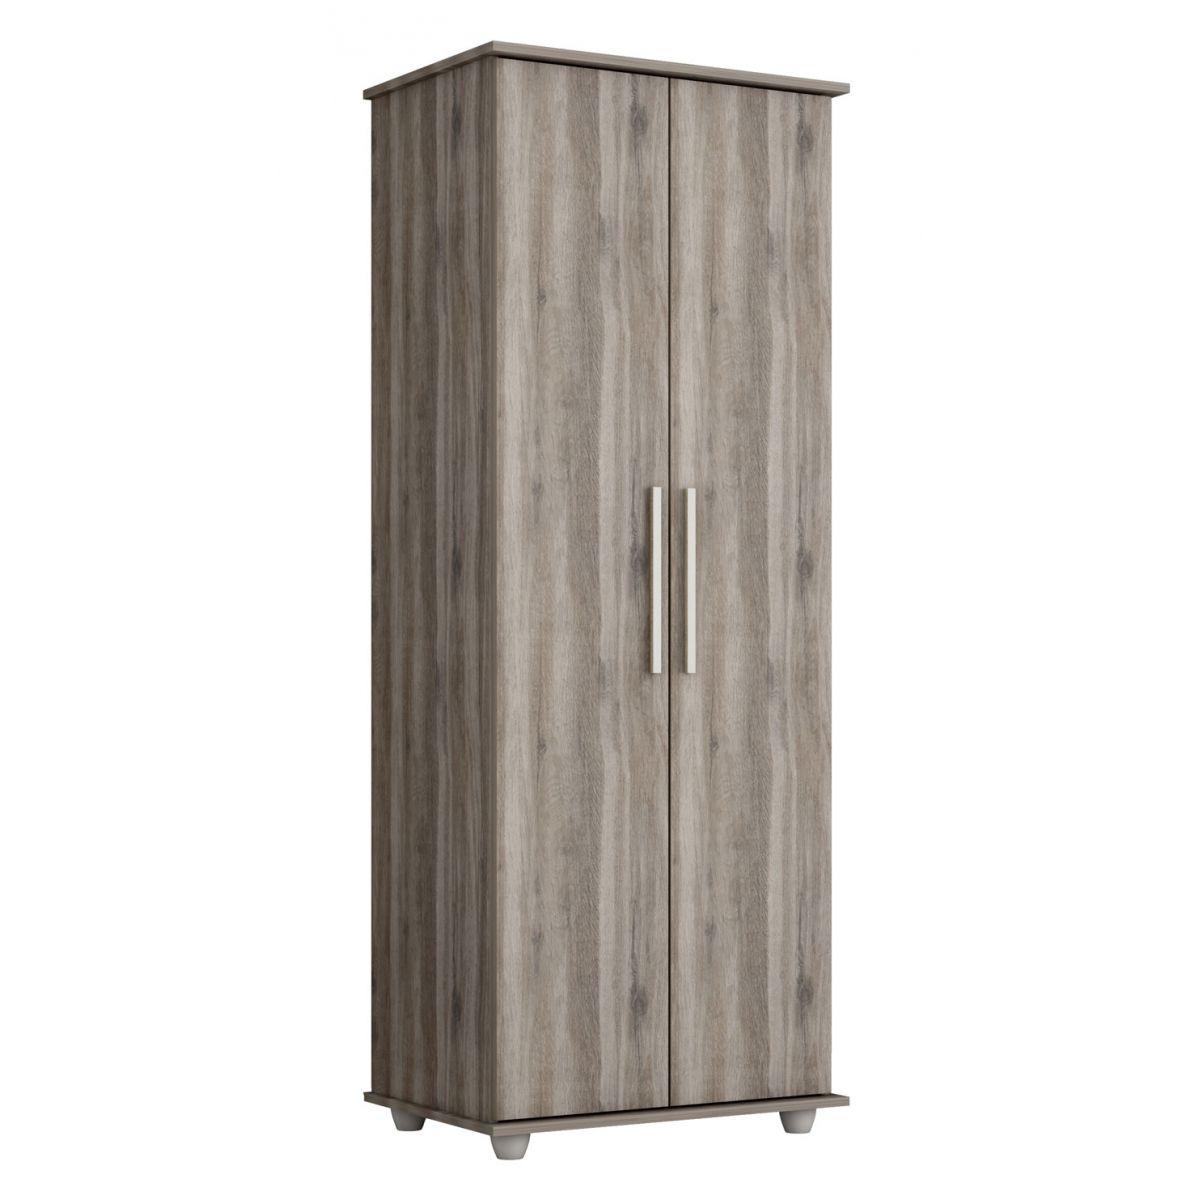 Arm�rio Multiuso �nix Teca Wood - Germai